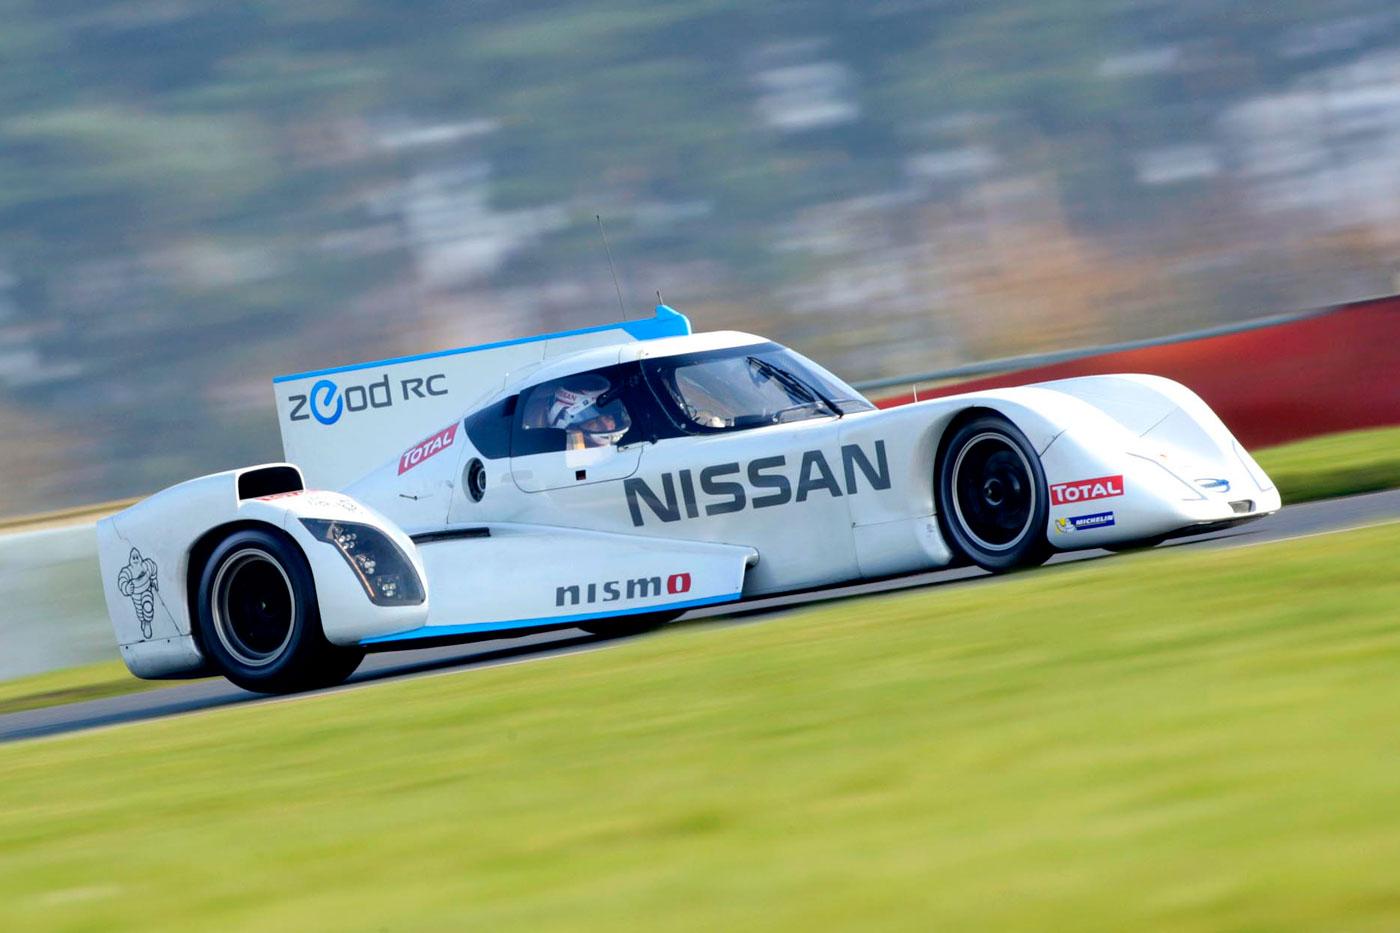 Nissan 88 Pound Engine Nissan Builds An Cylinder Engine